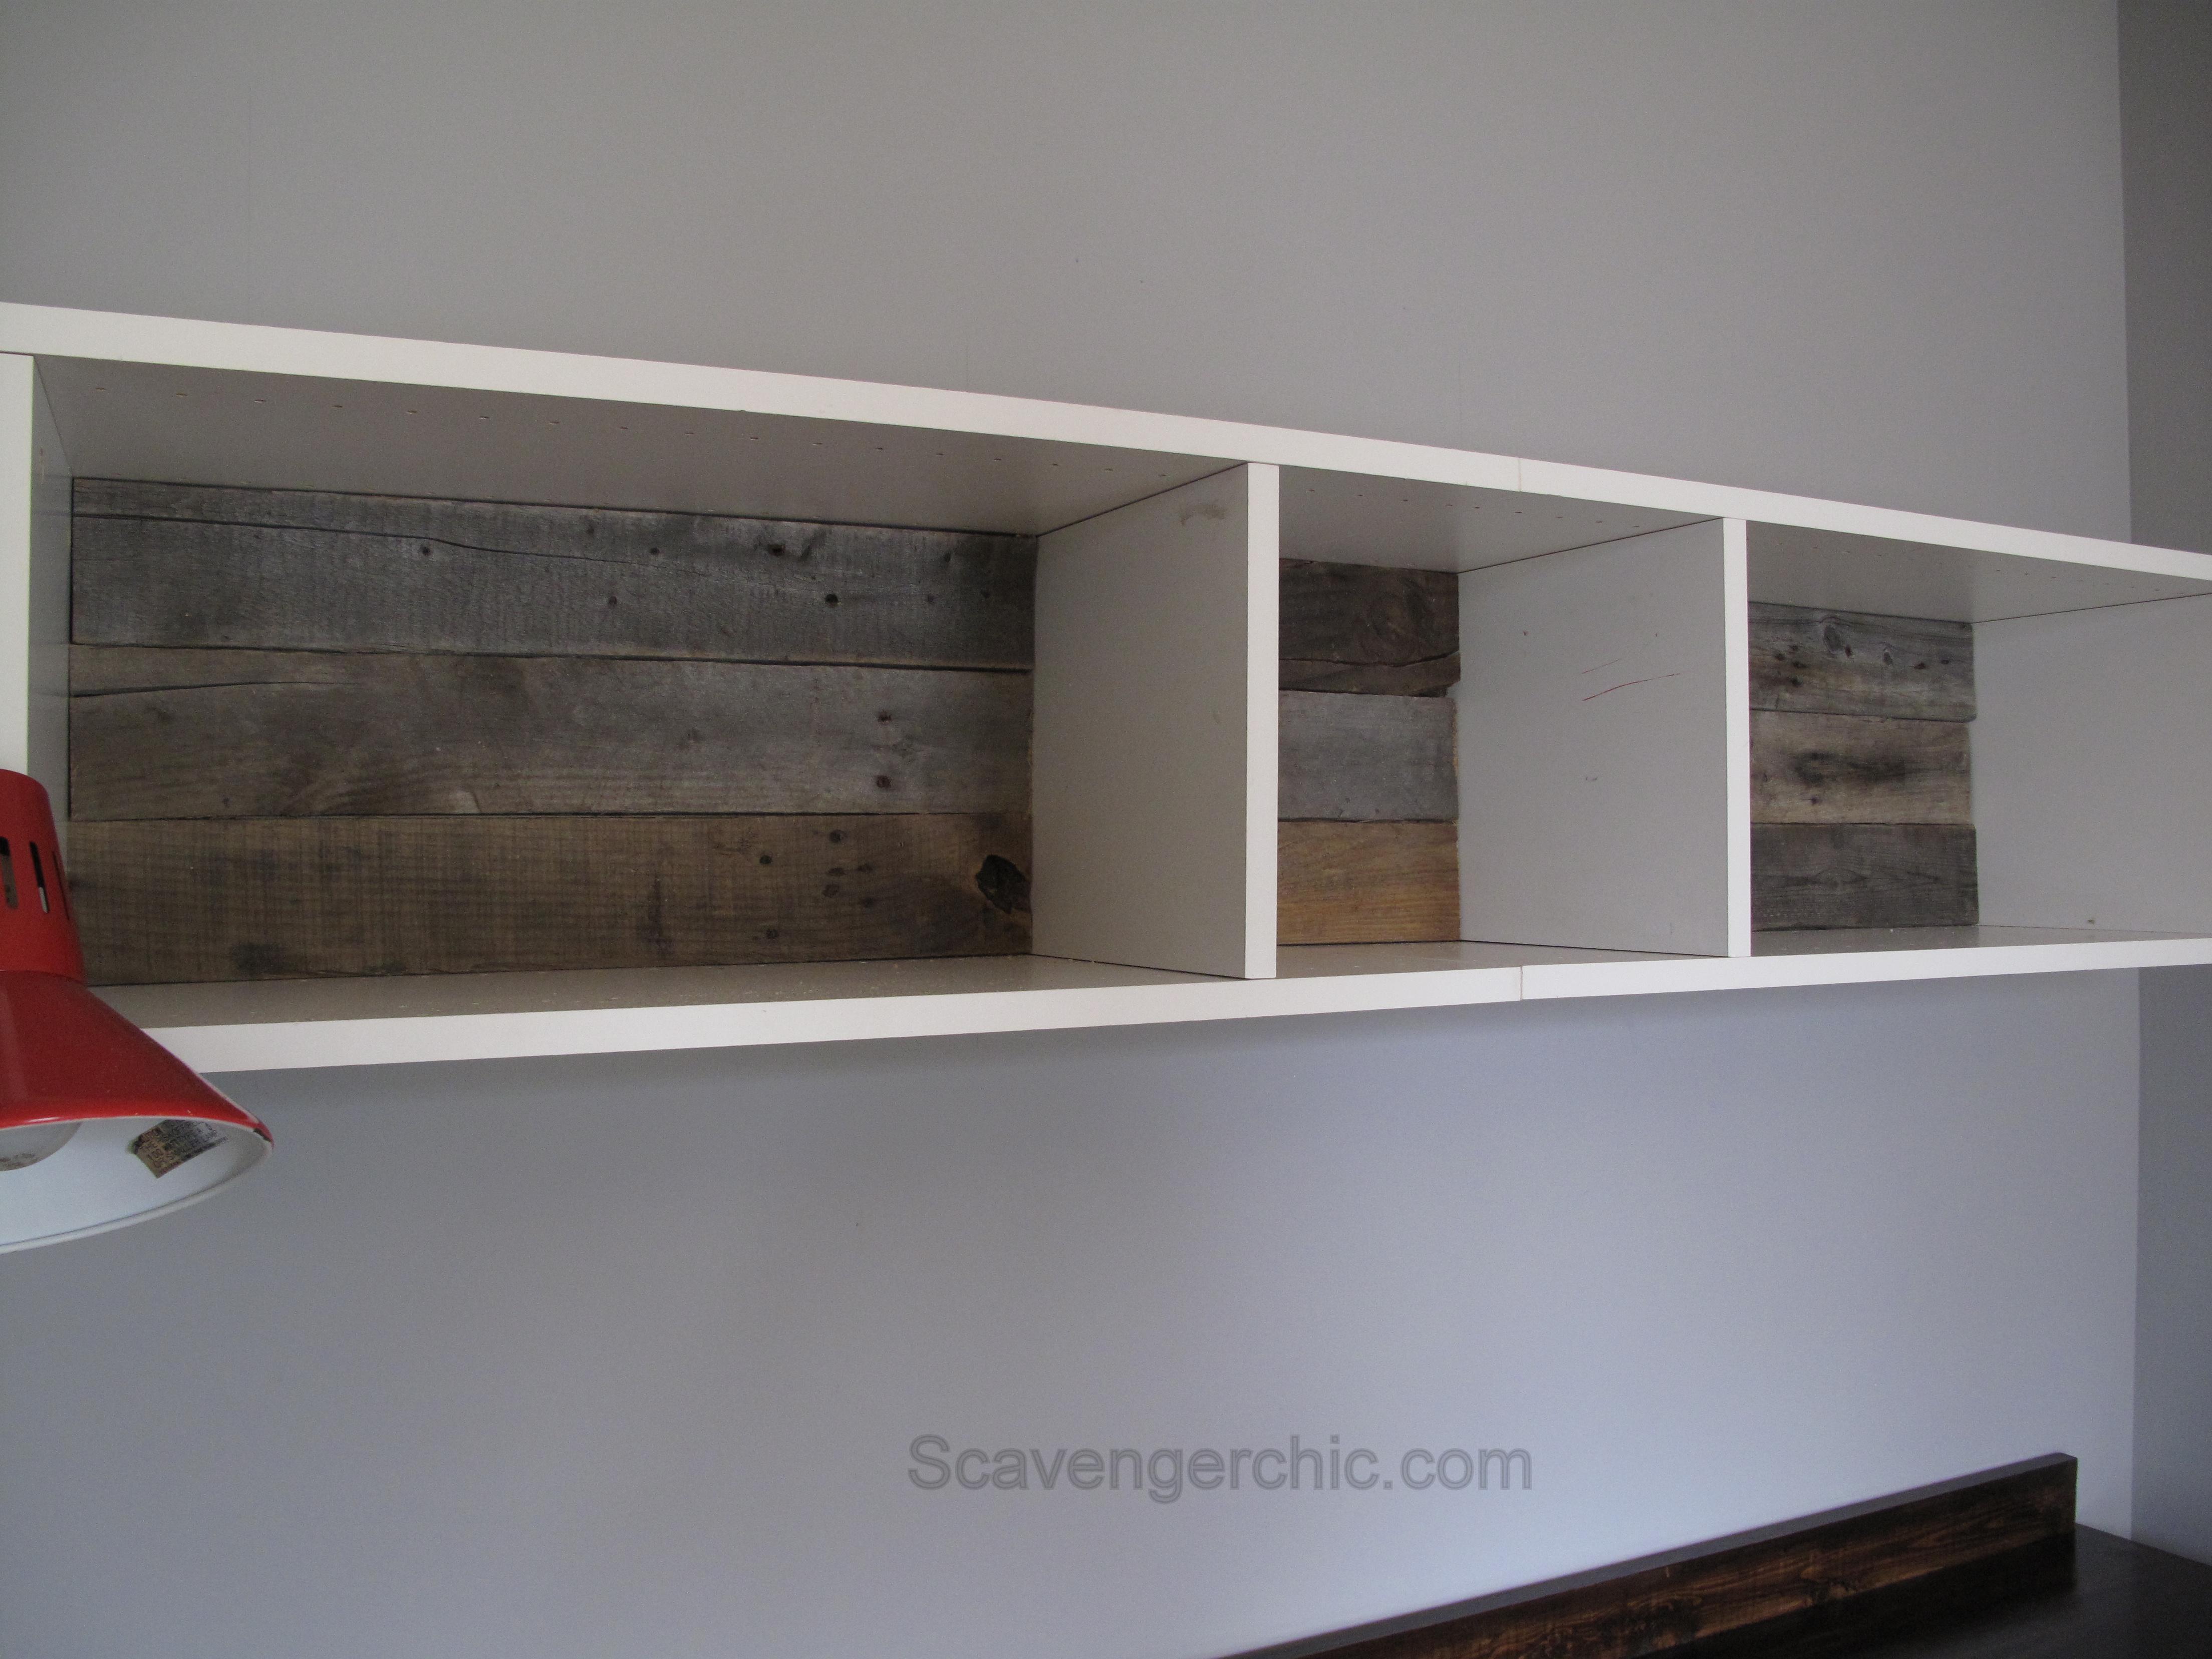 Teenage Boys Bedroom Over The Desk Shelves Ikea Pallet Wood Backing For Scavenger Chic